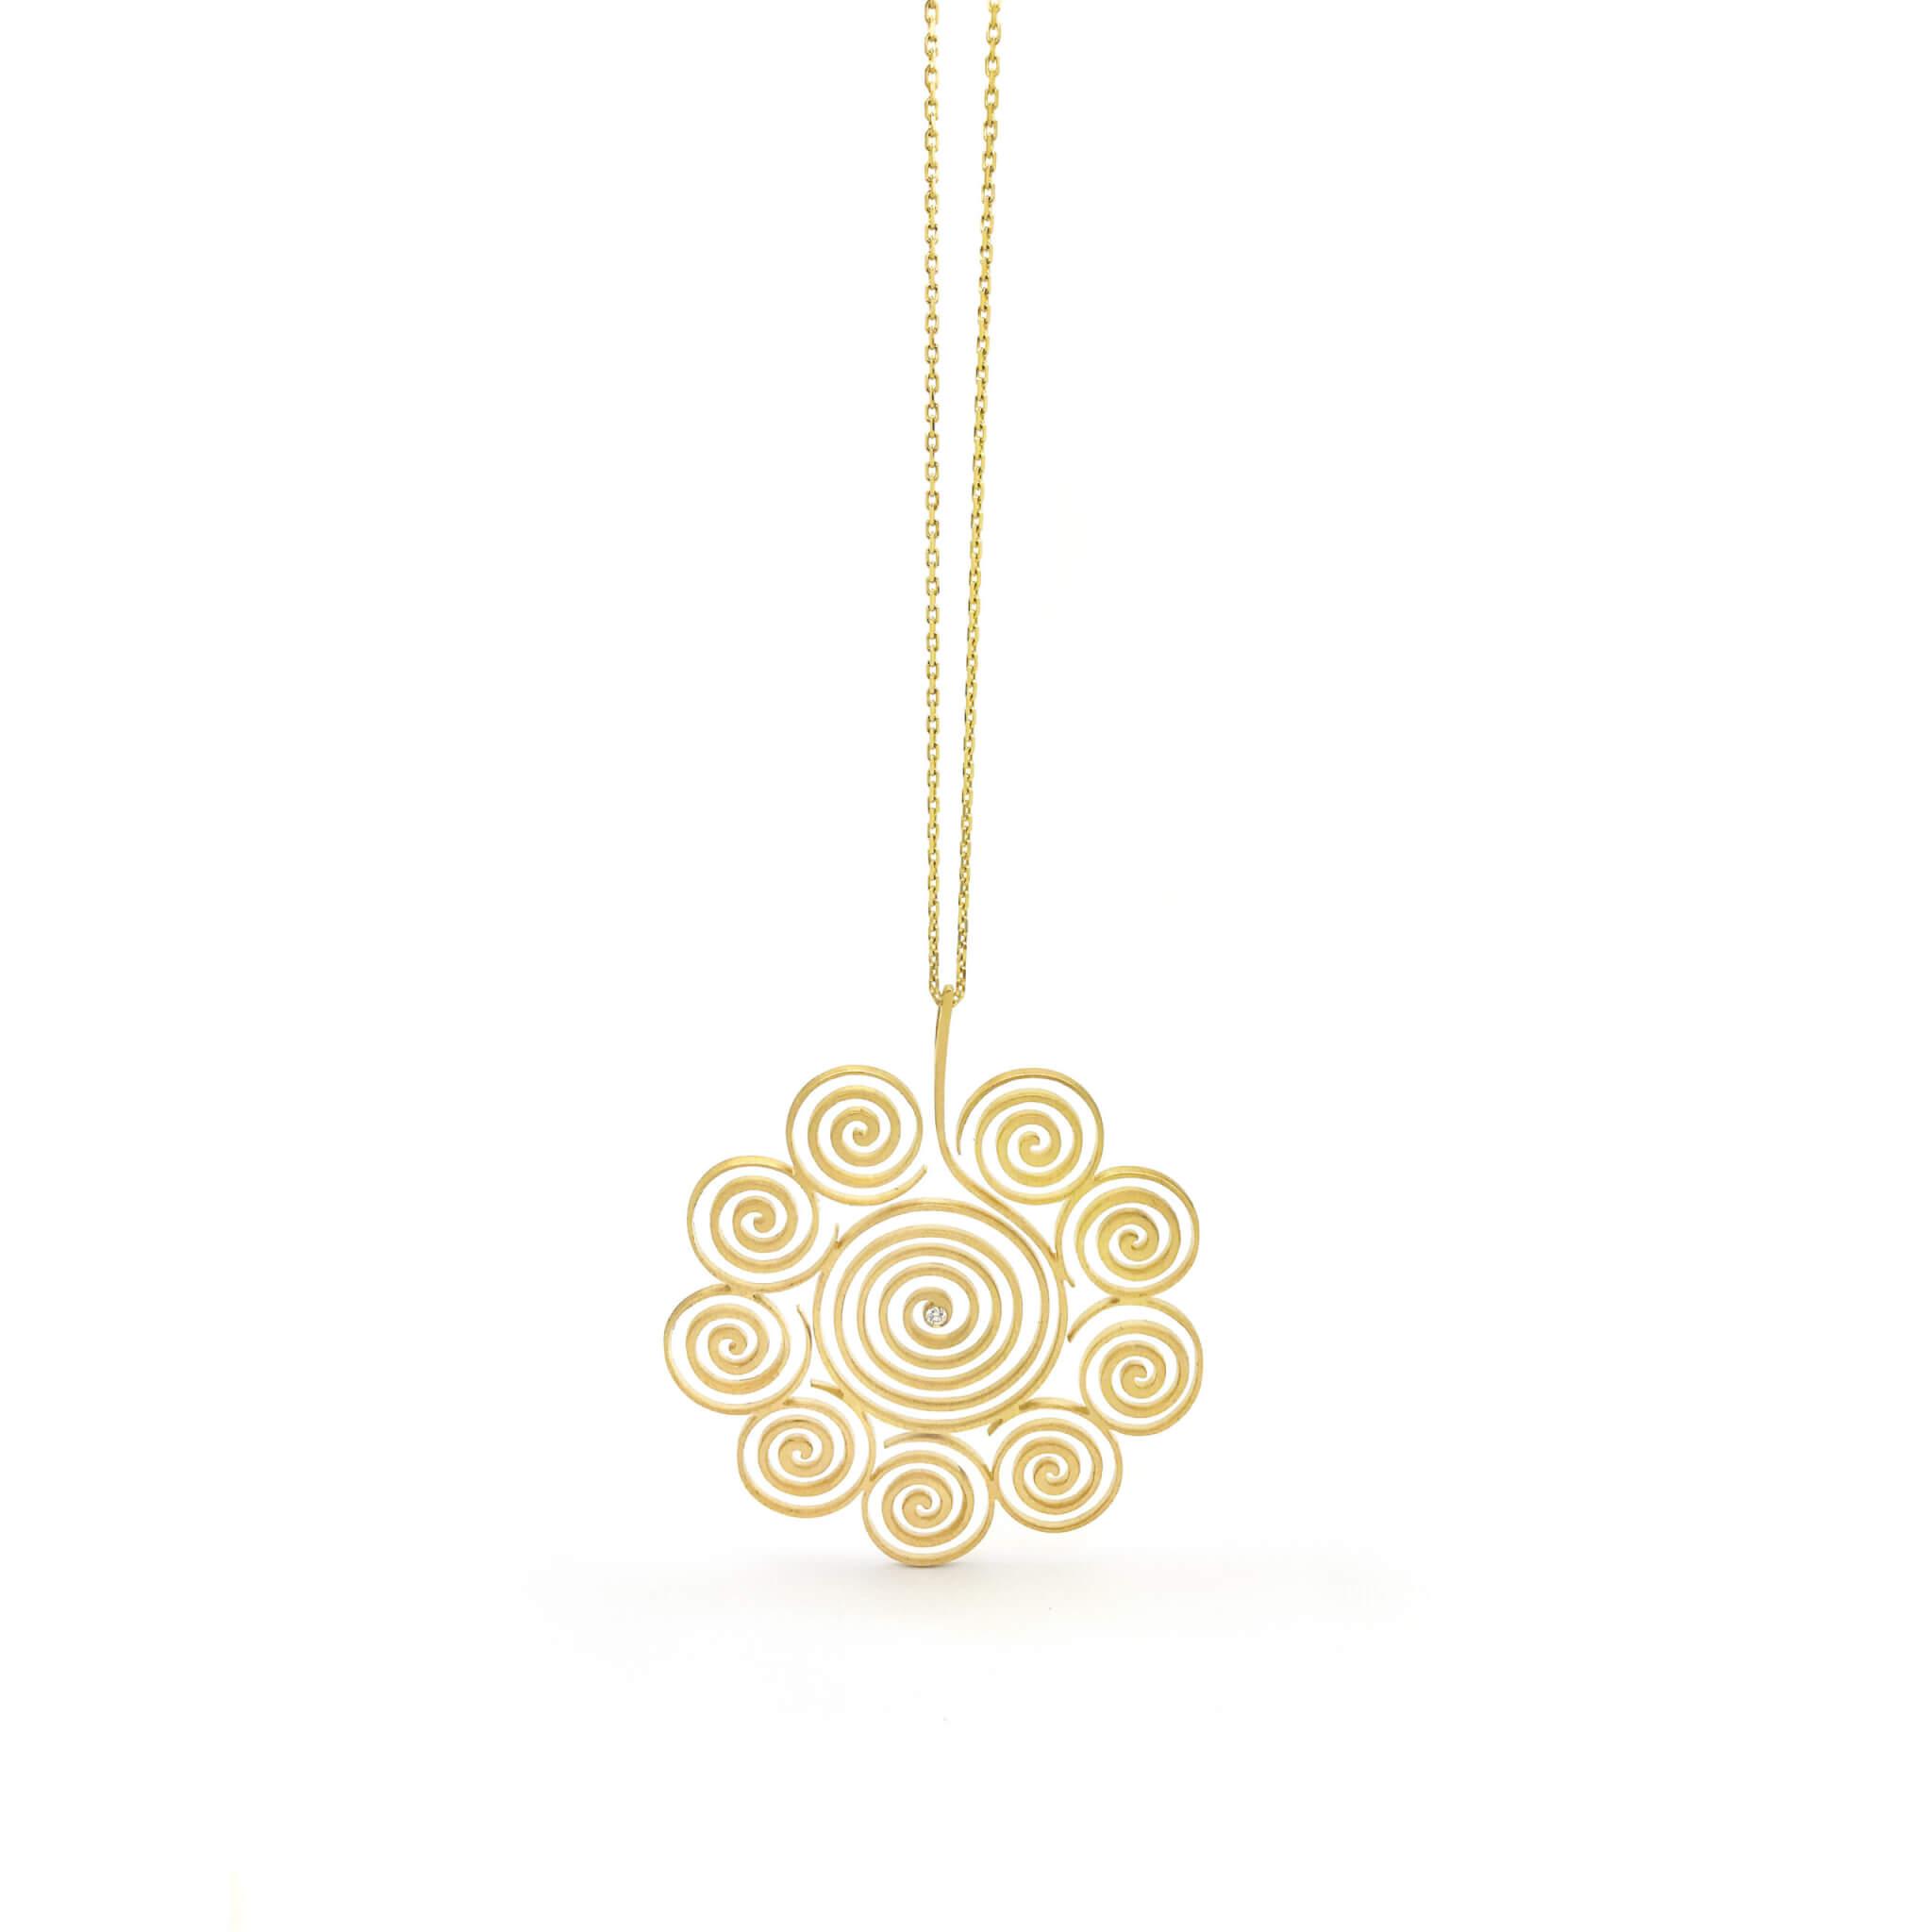 Spirale collier or diamant